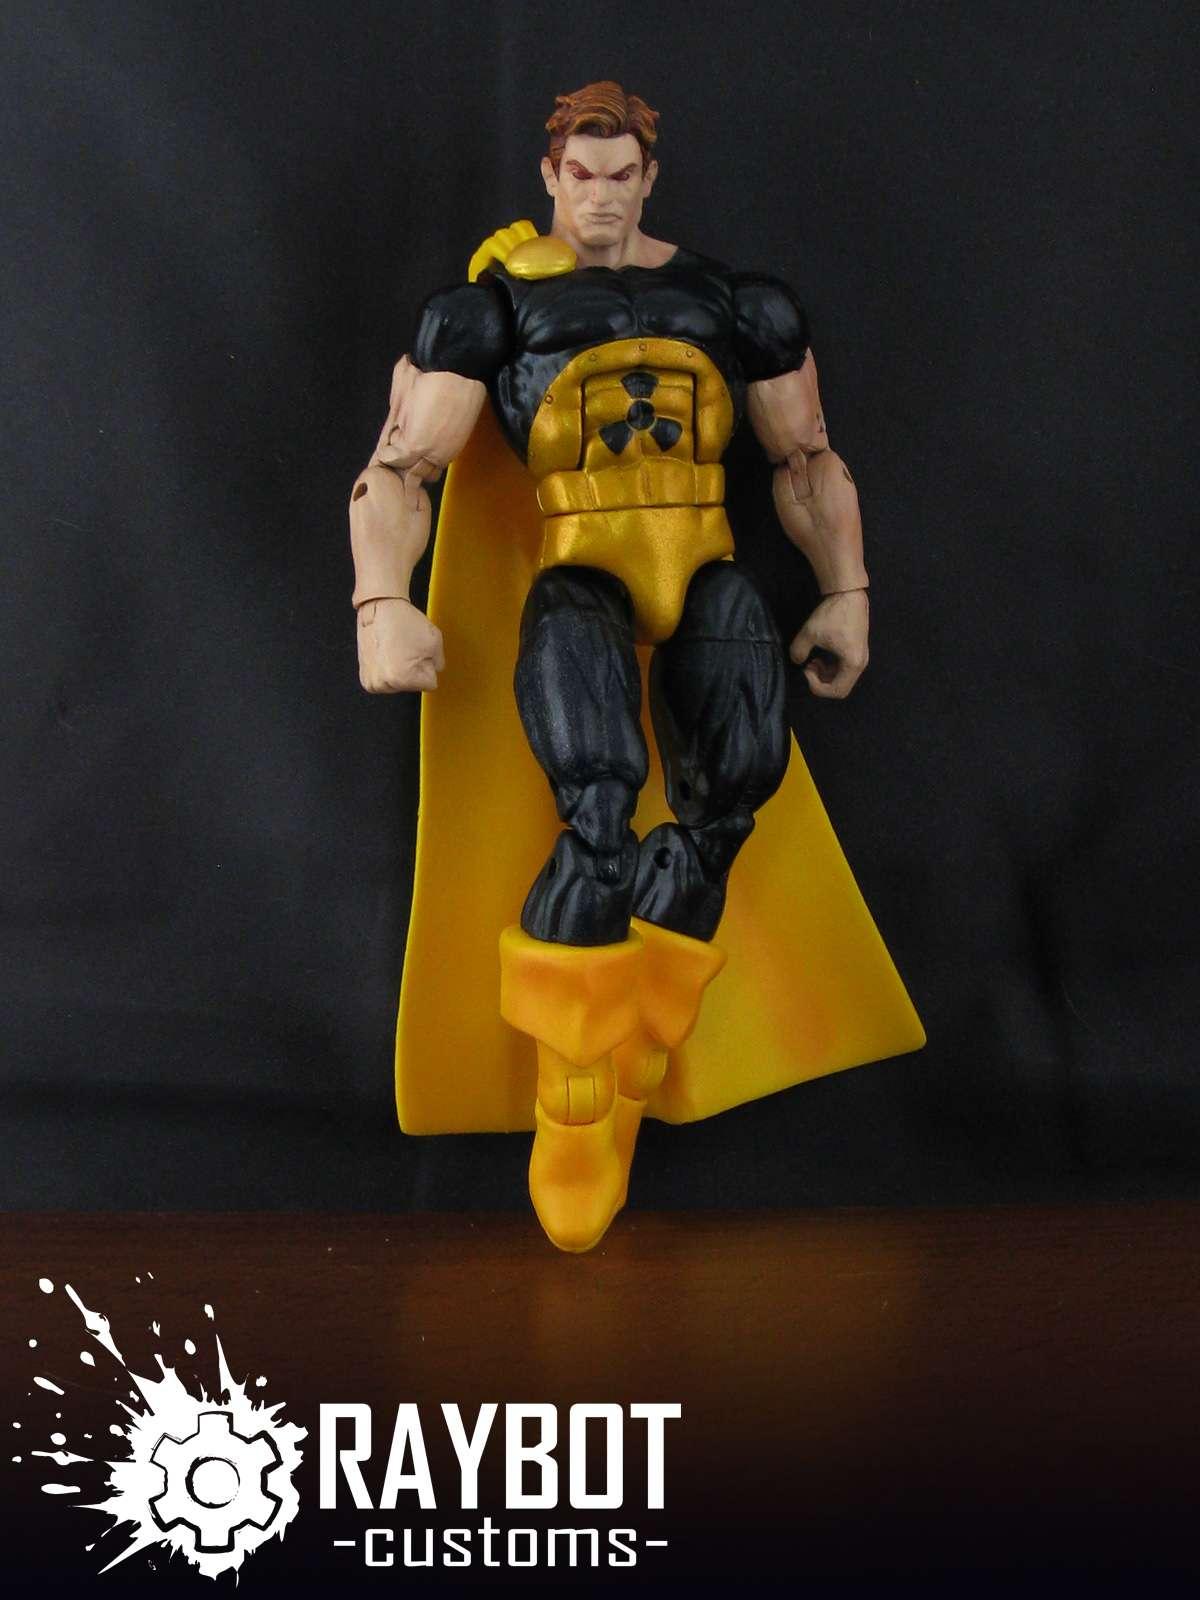 Raybot Wasp Wonder Man Nightcrawler Kitty P157 158